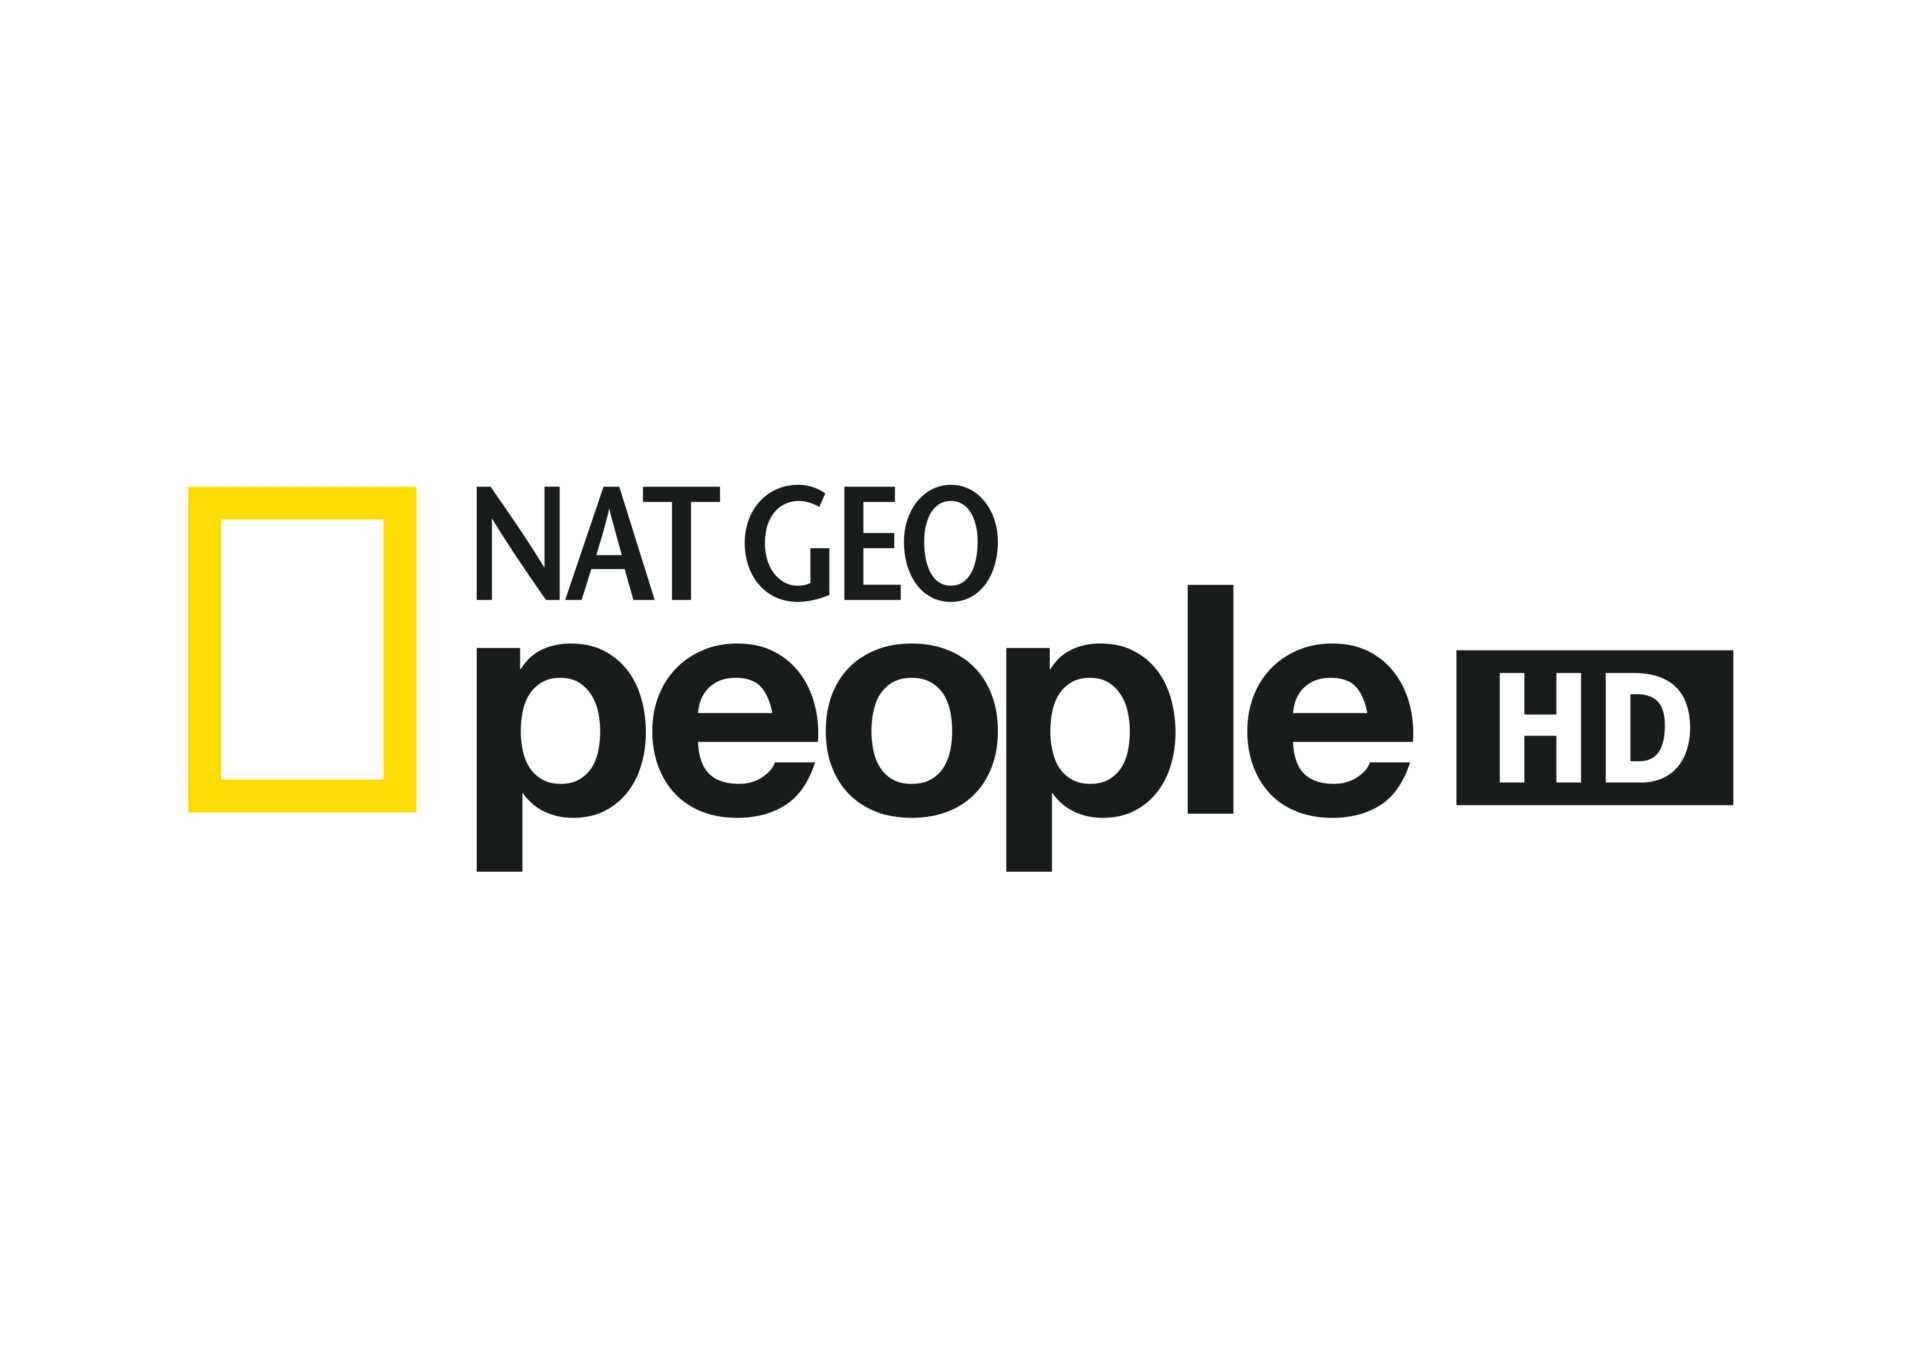 Nat Geo People: nuovo canale su Sky da Marzo | Digitale terrestre: Dtti.it